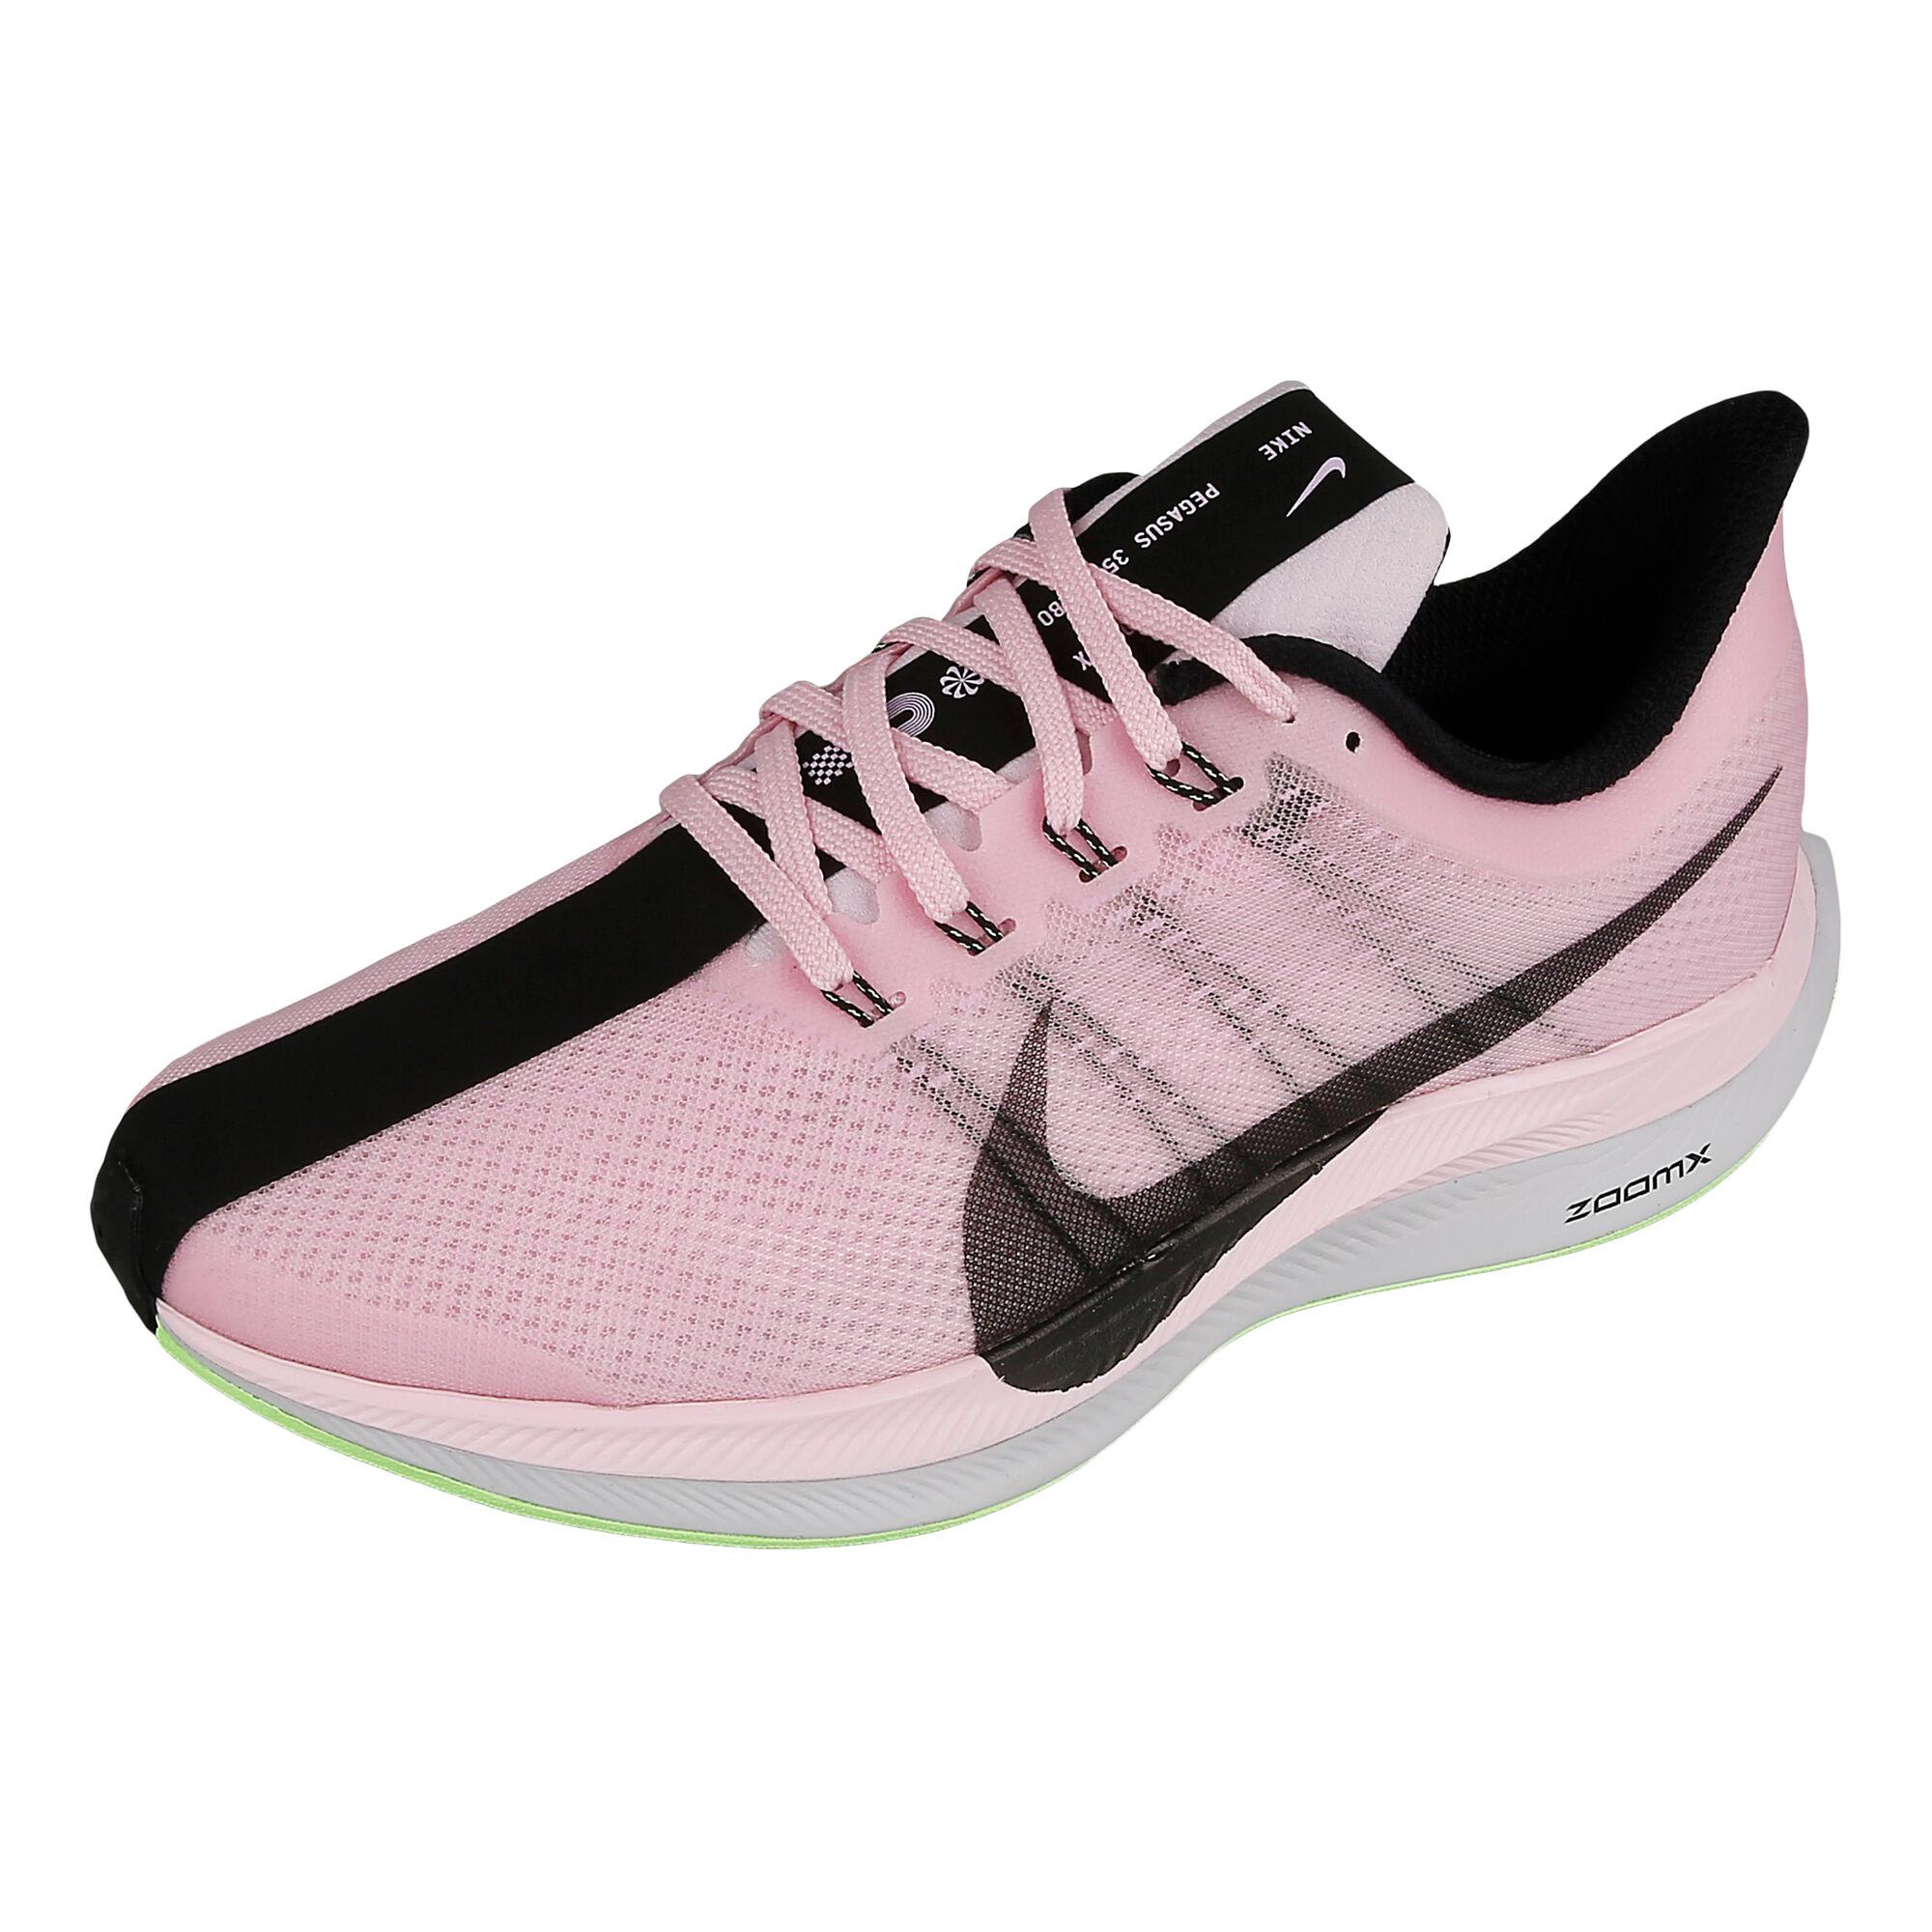 fbc651223e16 Nike  Nike  Nike  Nike  Nike  Nike  Nike  Nike  Nike. Zoom Pegasus 35 Turbo  Women ...